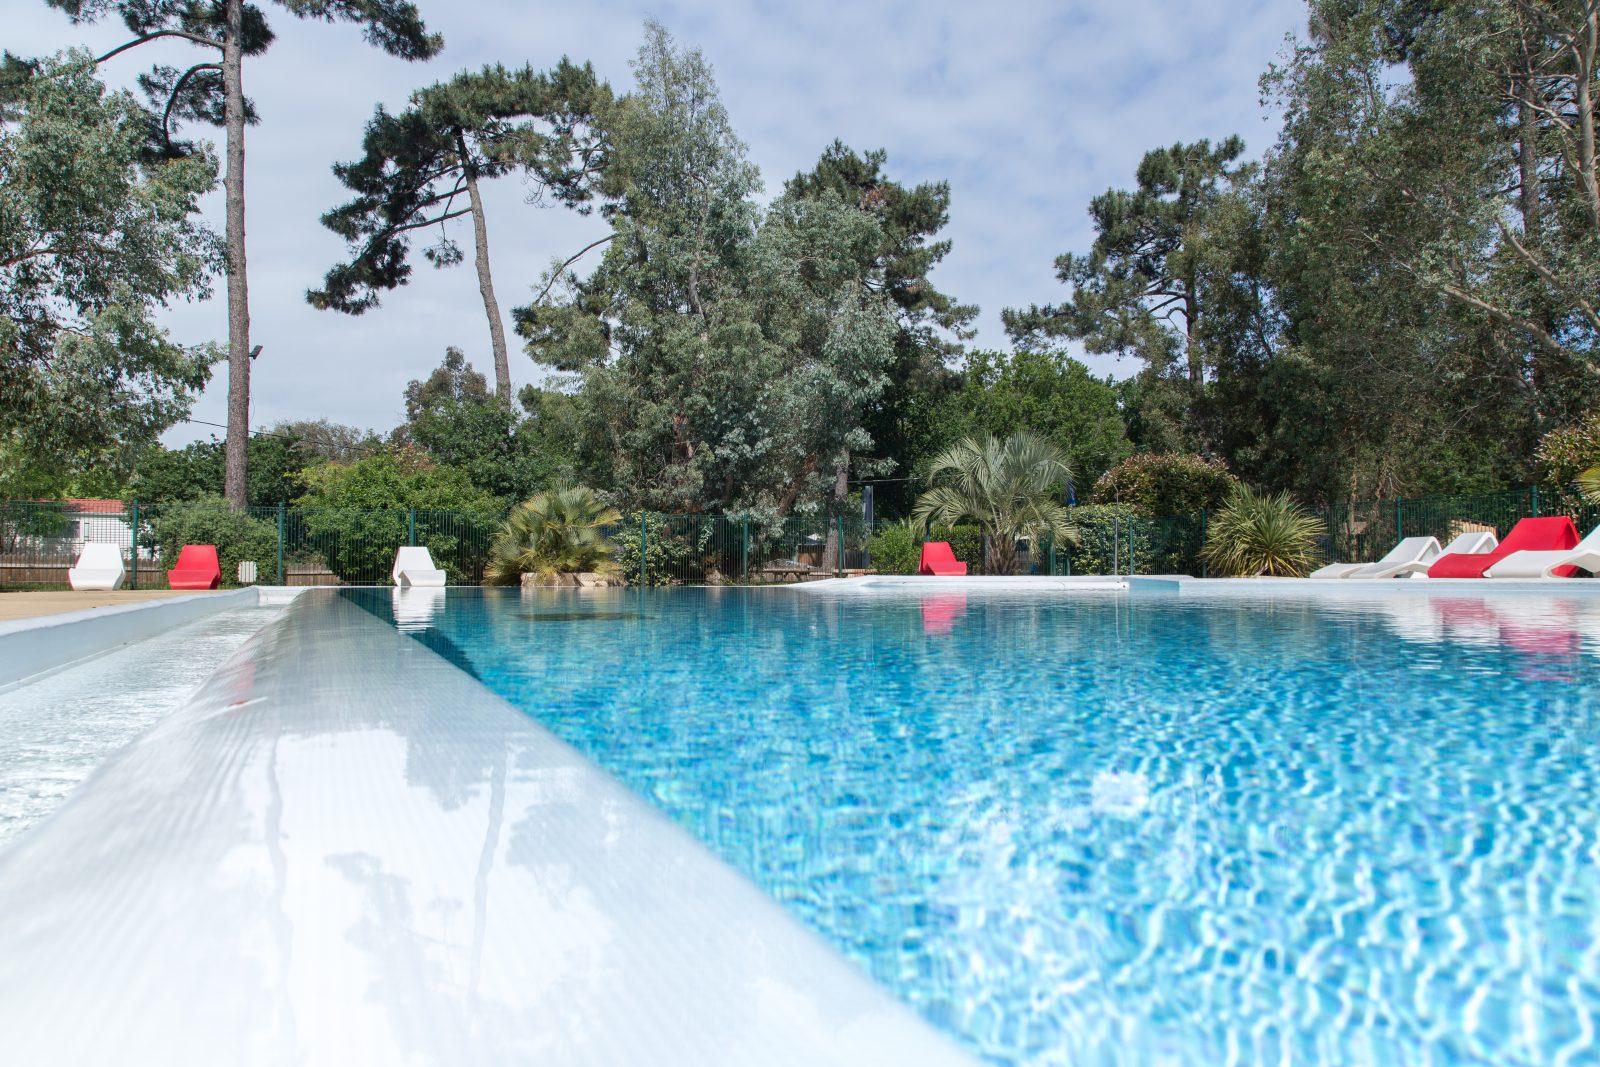 activite-PISCINE-Camping-des-Pins-Gironde-Soulac-sur-Mer